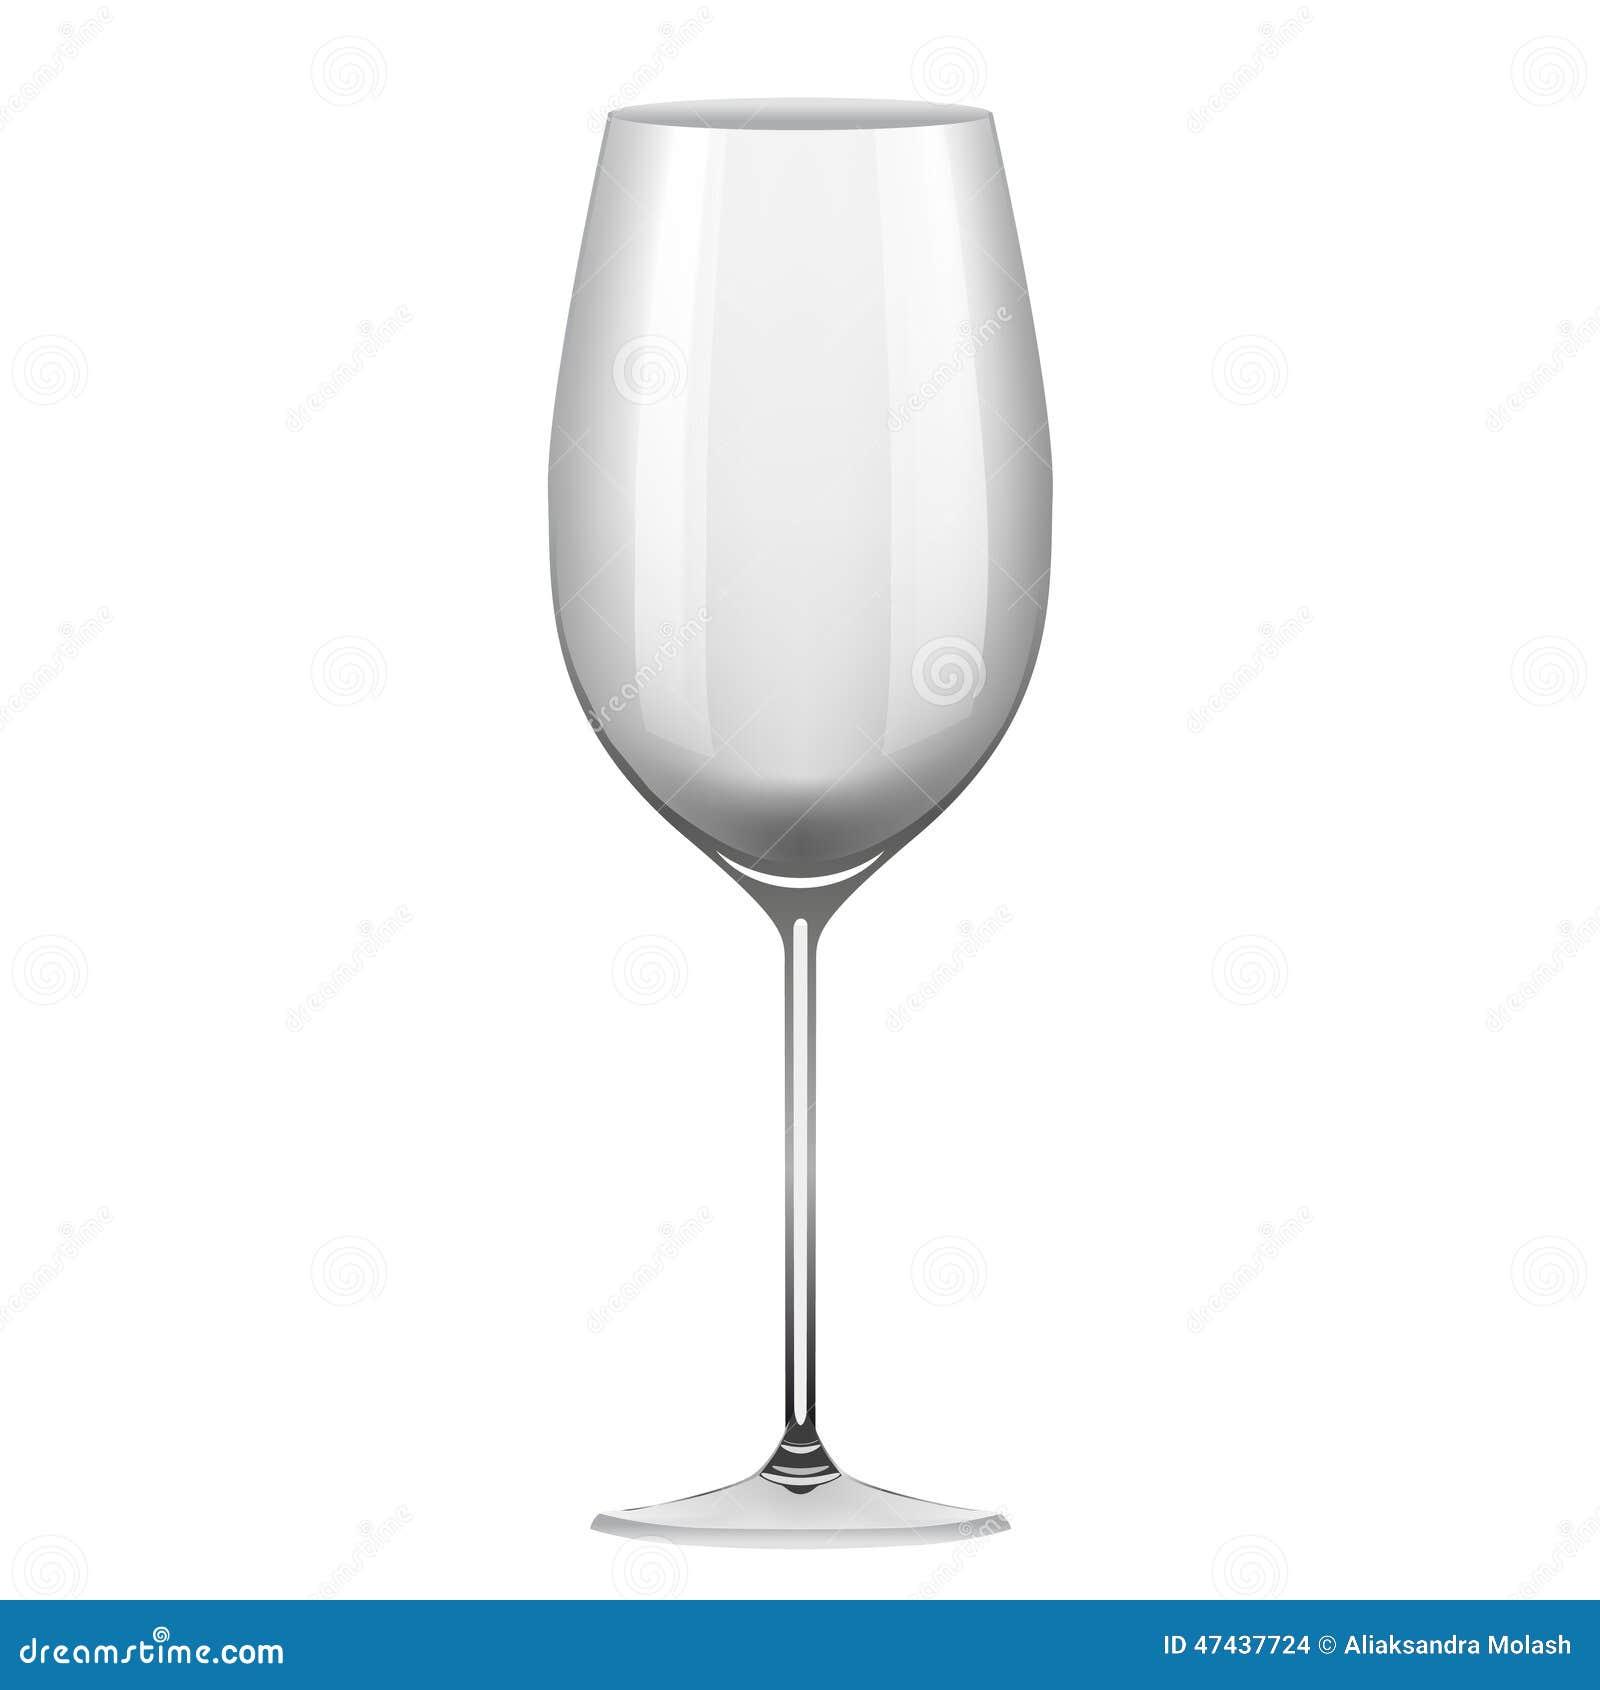 objet de verre vin sur le fond blanc illustration de. Black Bedroom Furniture Sets. Home Design Ideas